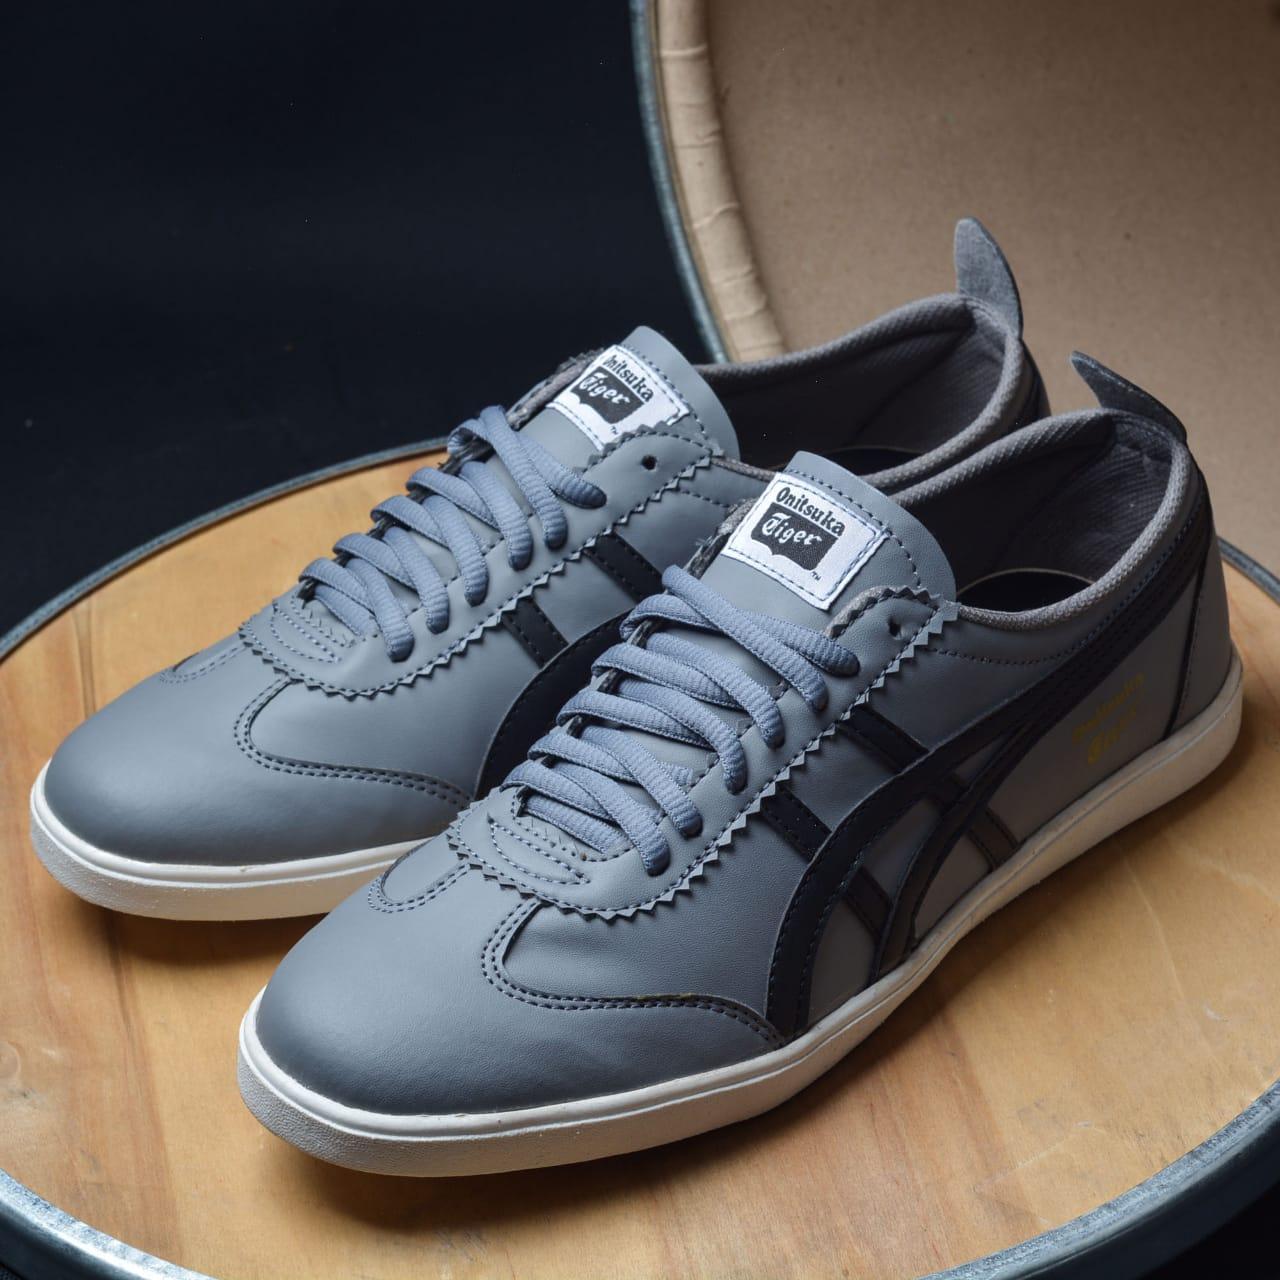 Sepatu Pria Sport Asics Tiger Terlaris Di LAZADA - Grey -